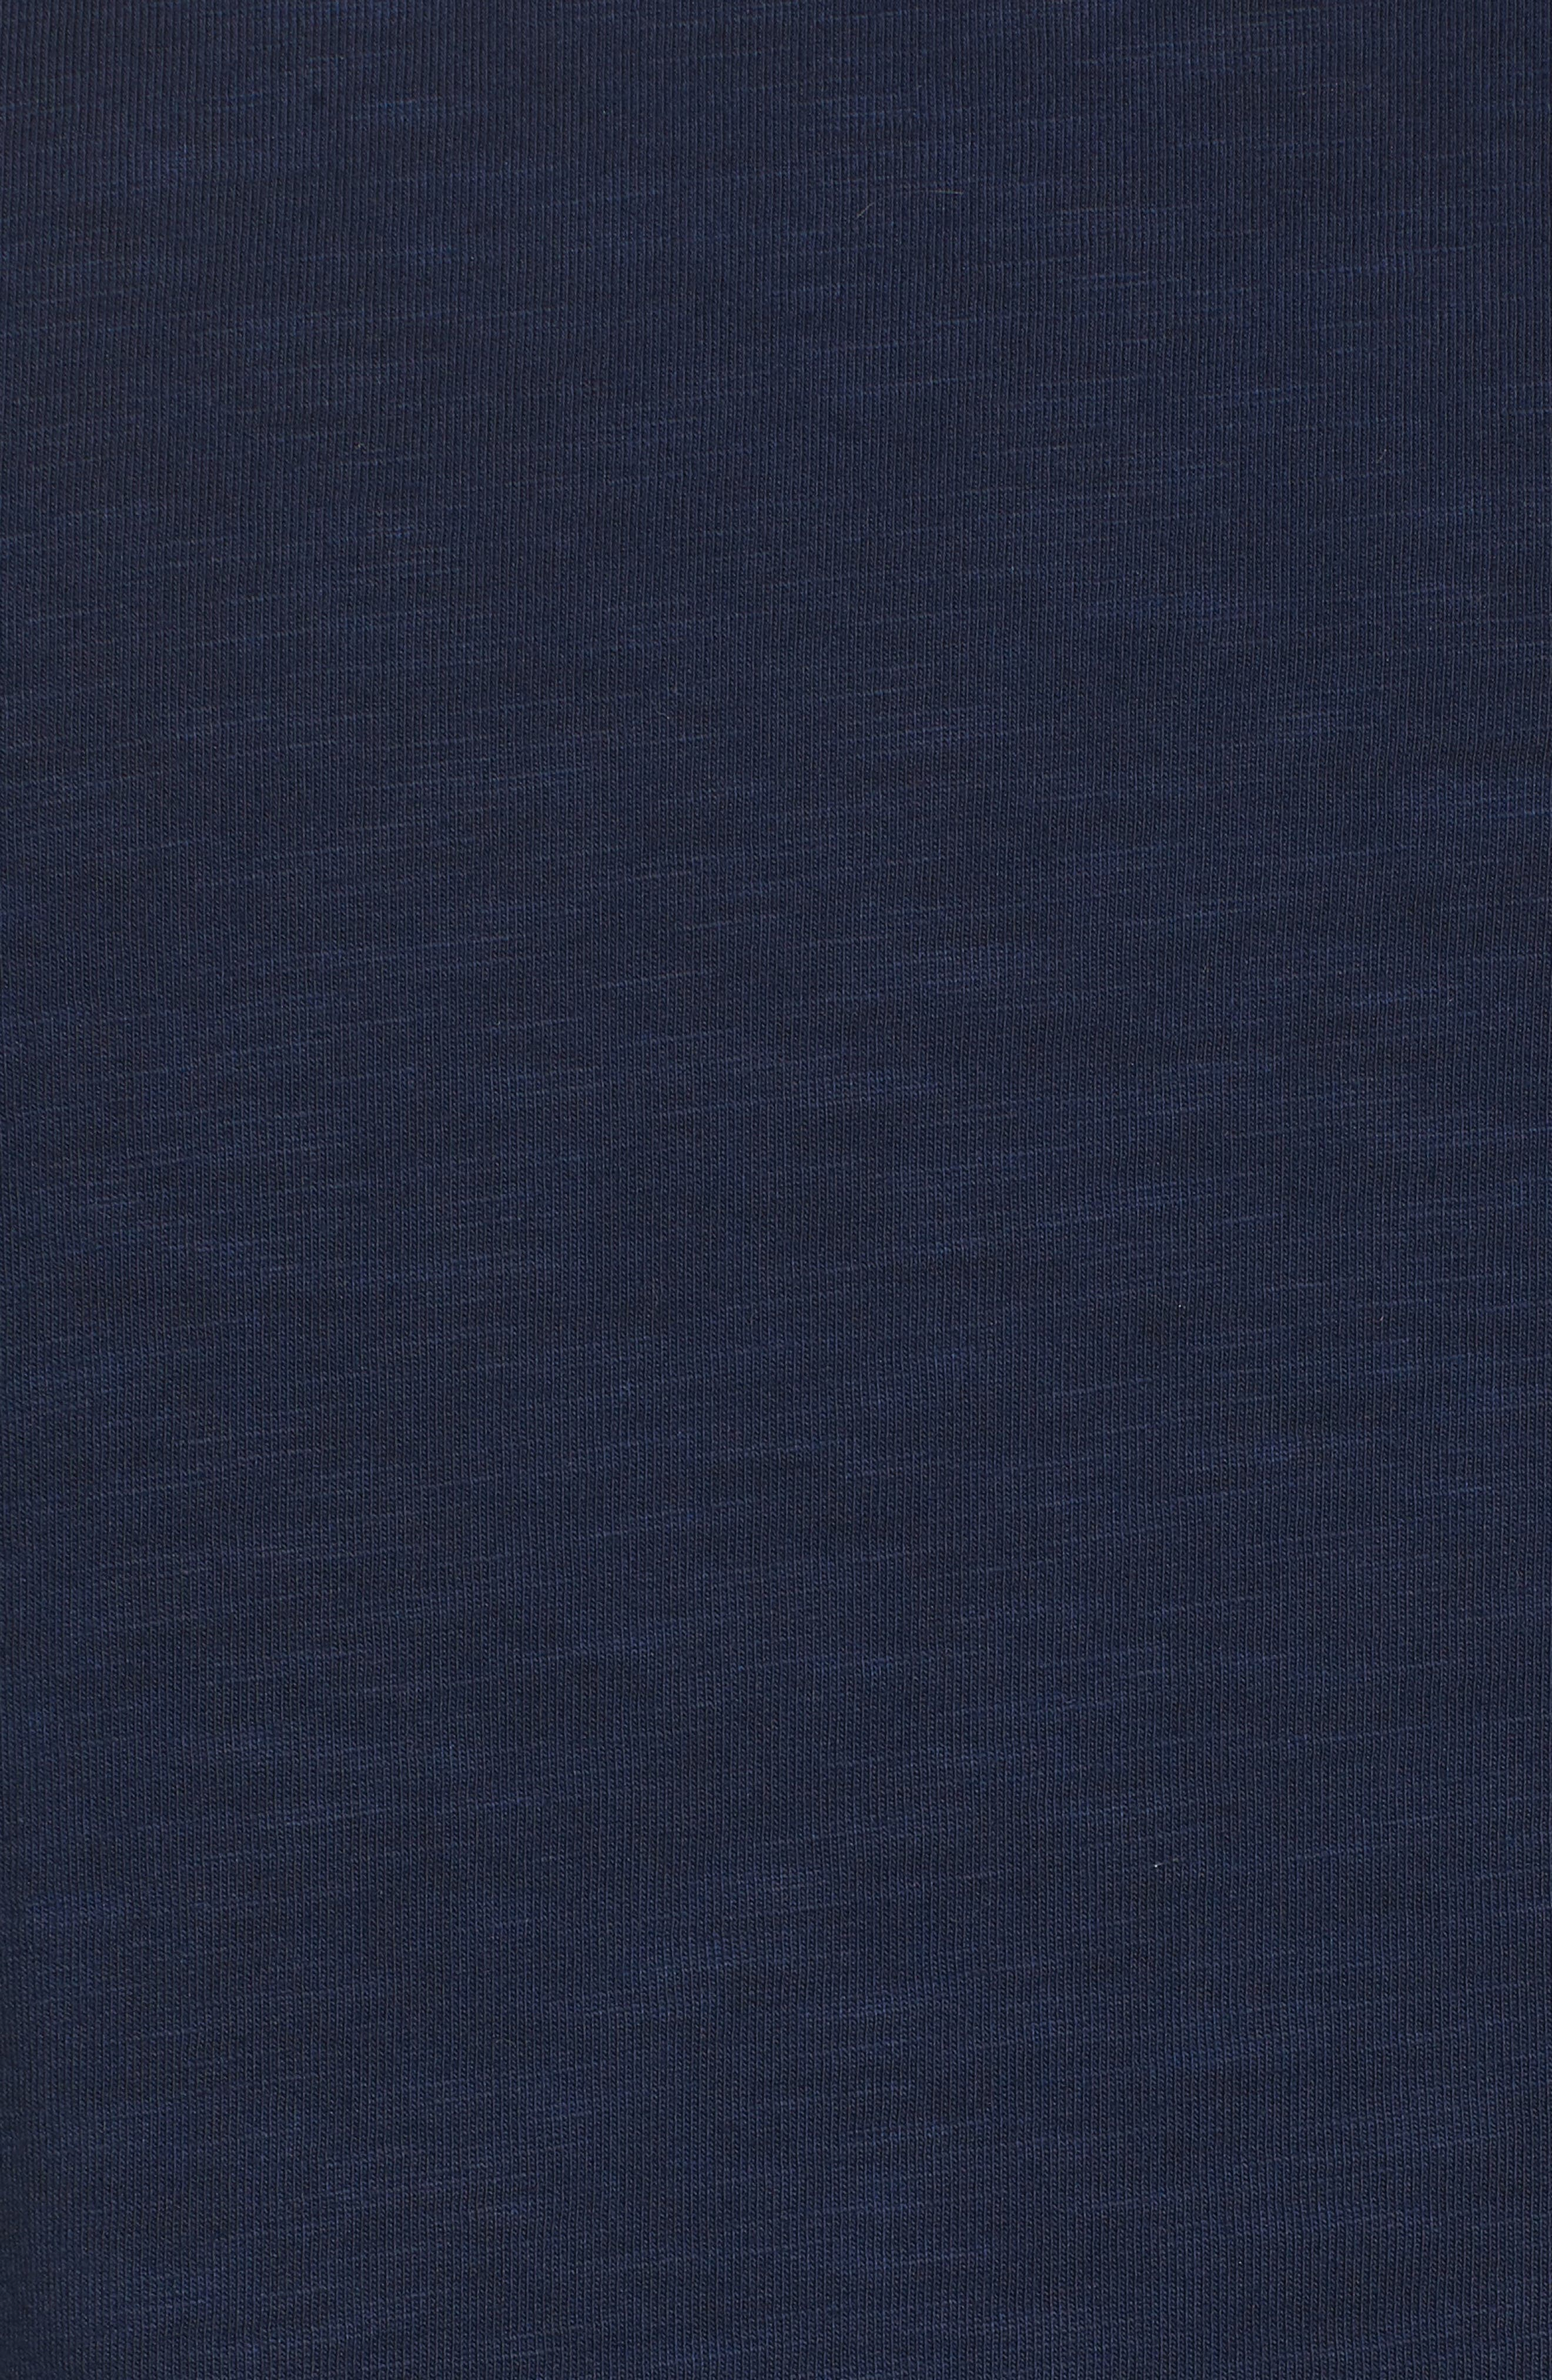 Stalt Pocket T-Shirt,                             Alternate thumbnail 5, color,                             400